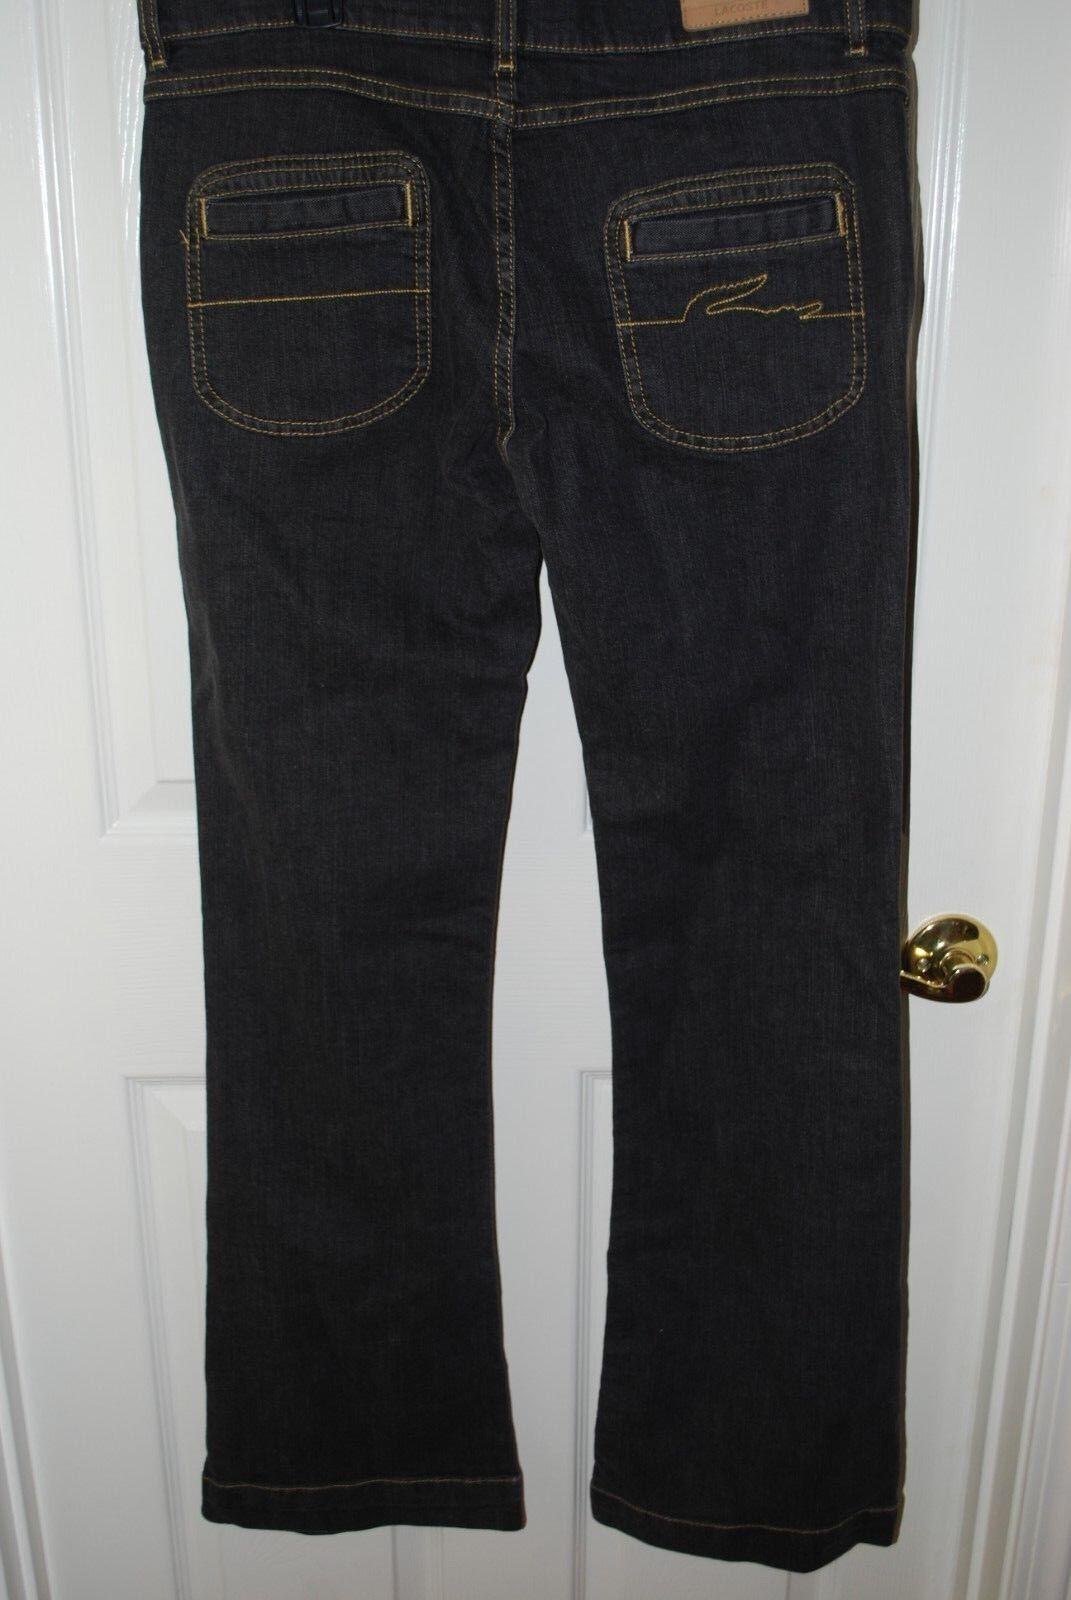 New LACOSTE Jeans Vintage bluee Straight Leg 34  Inseam Women's Size 12